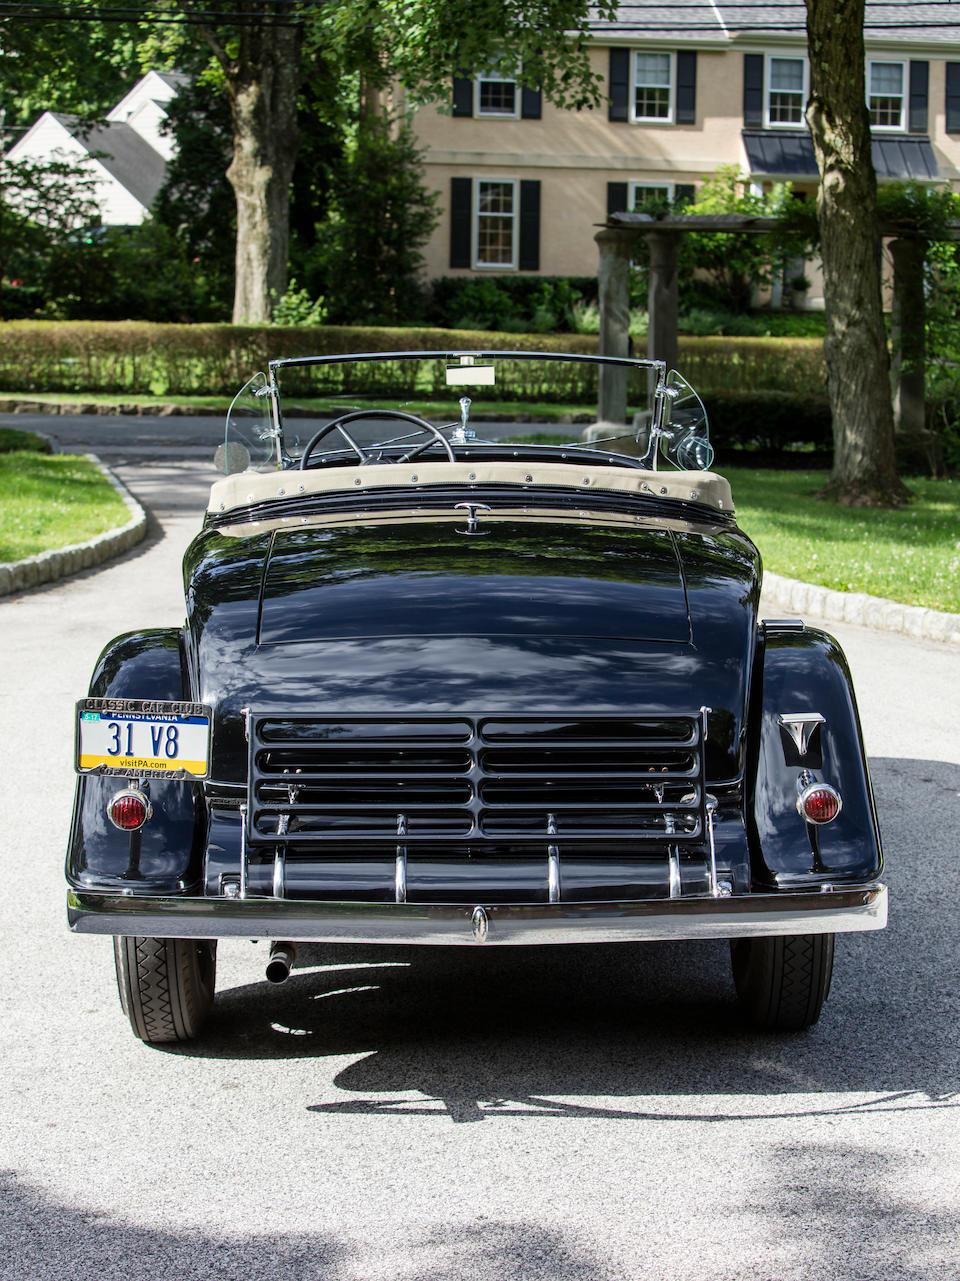 <b>1931 Cadillac 355-A V-8 Roadster</b><br />Engine no. 808162<br />Body no. 88